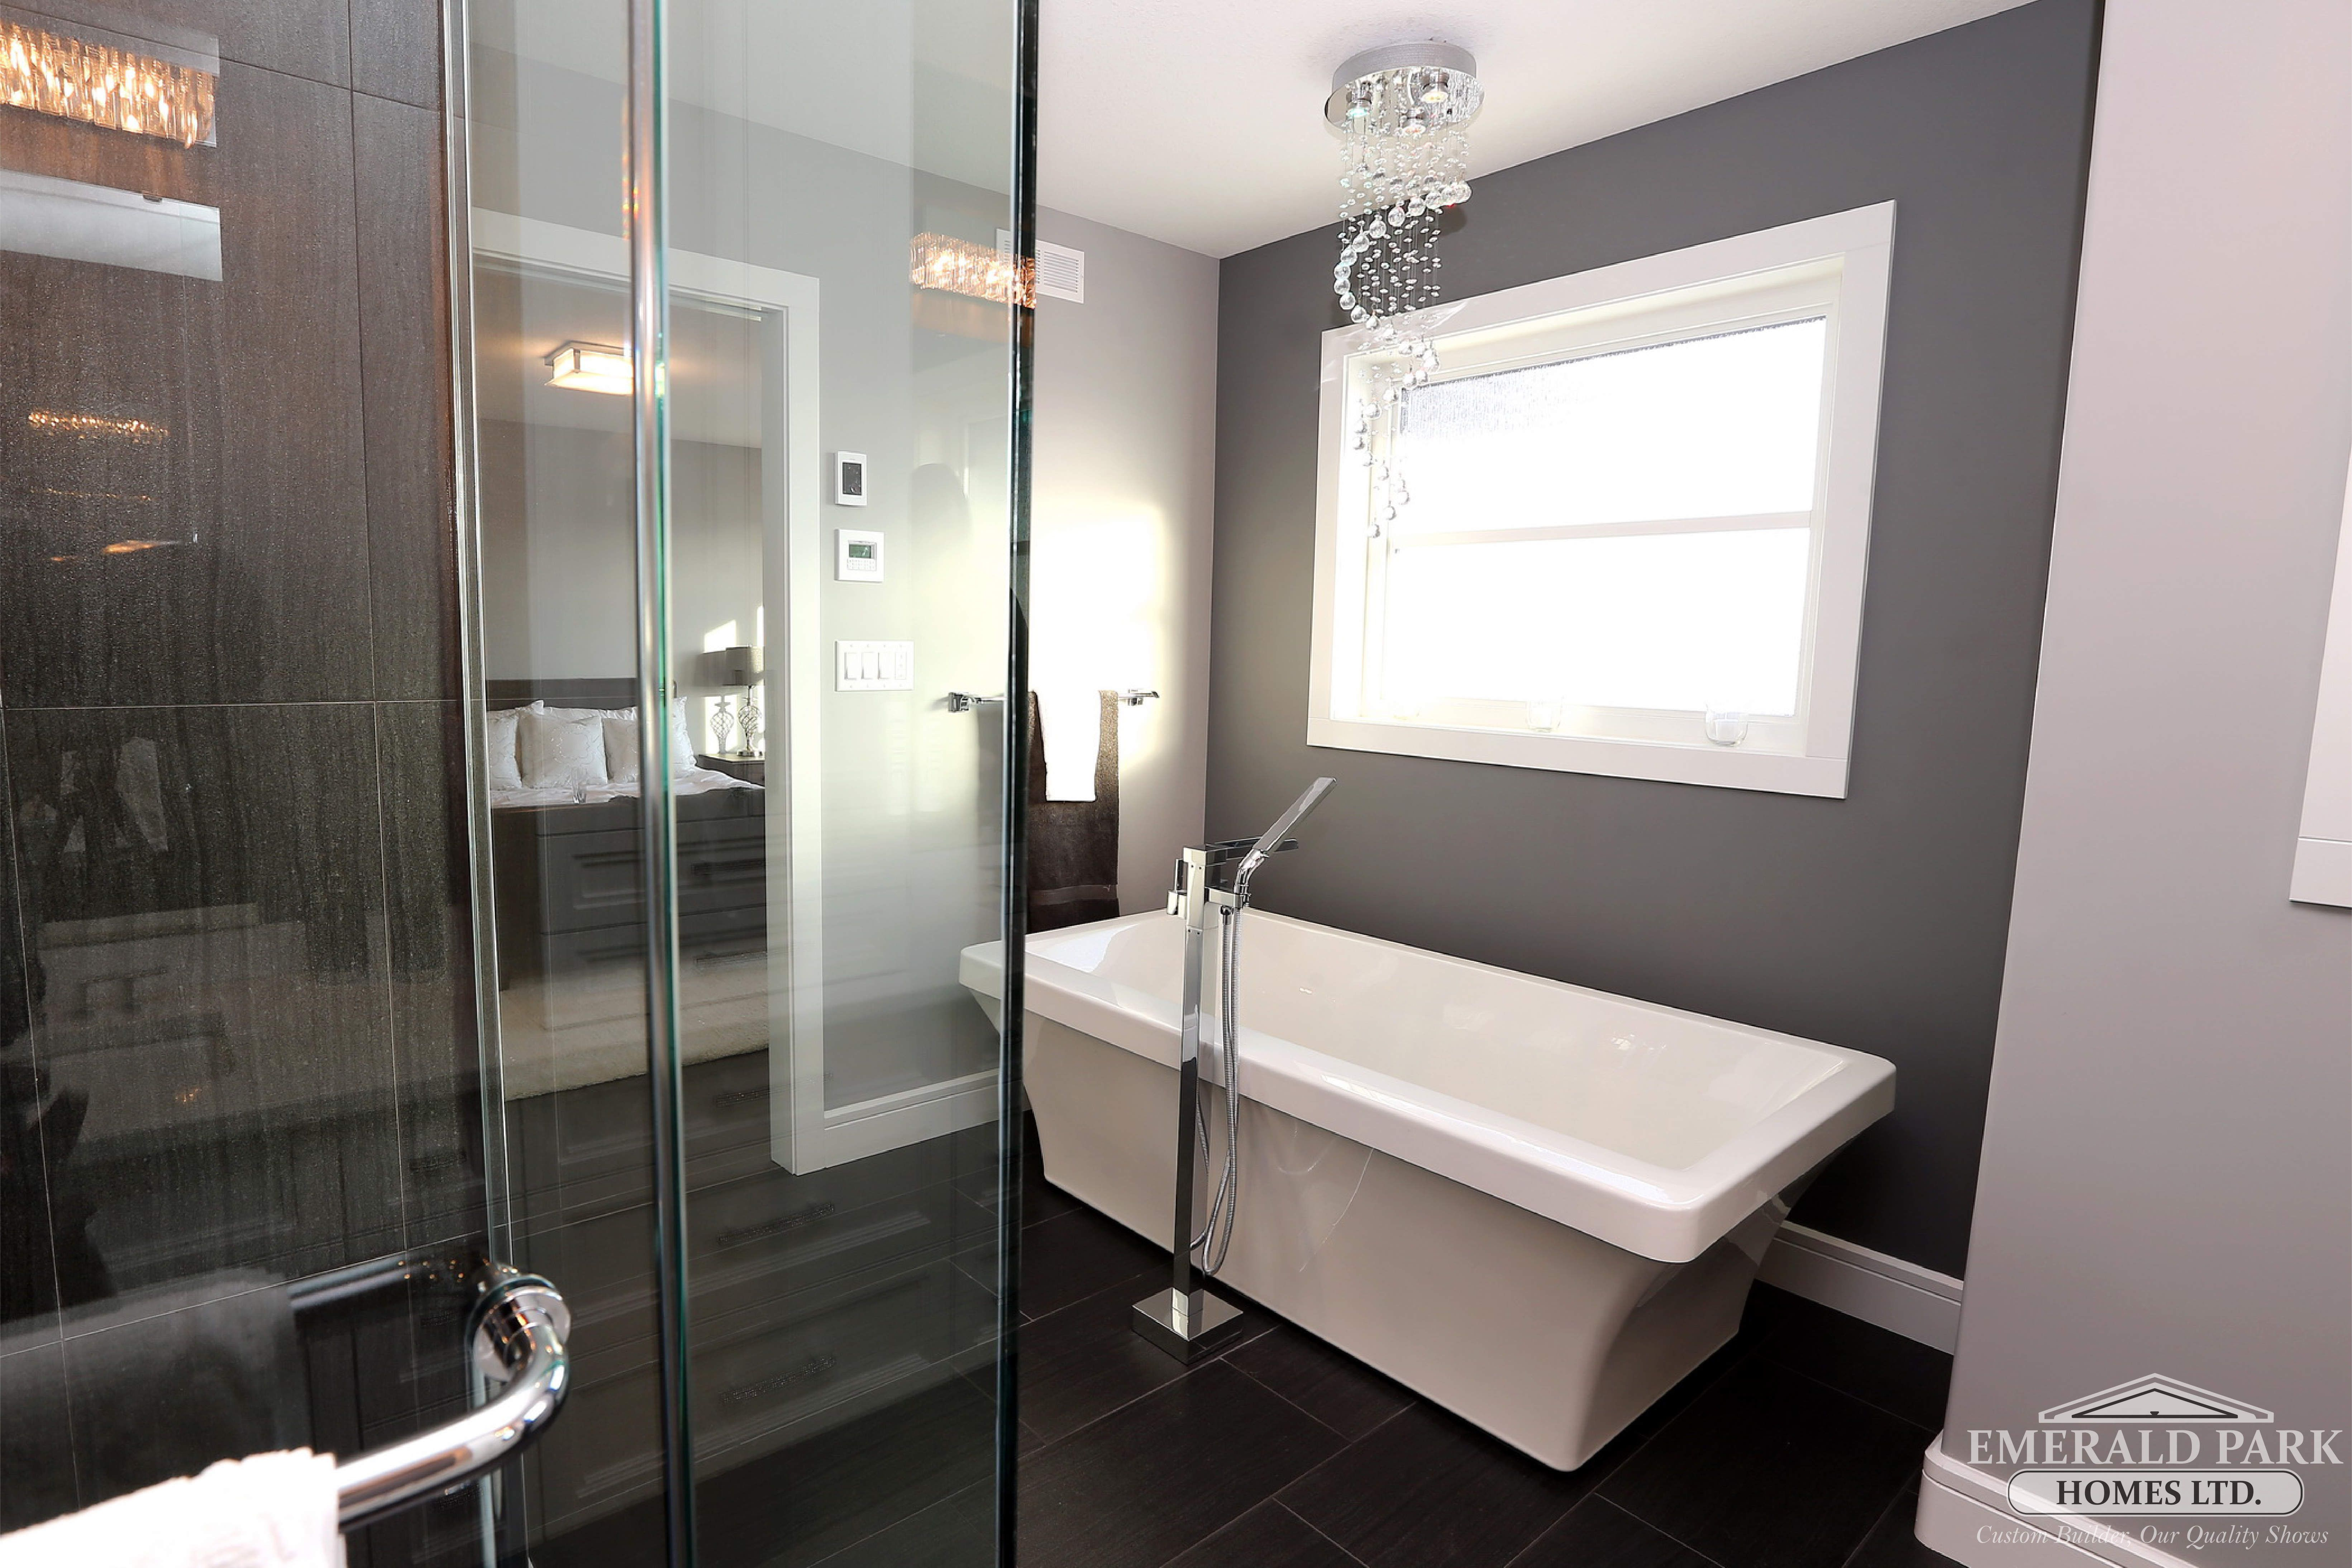 Spalike Master Ensuite With Freestanding Soaker Tub And Custom Glamorous Master Ensuite Bathroom Designs Inspiration